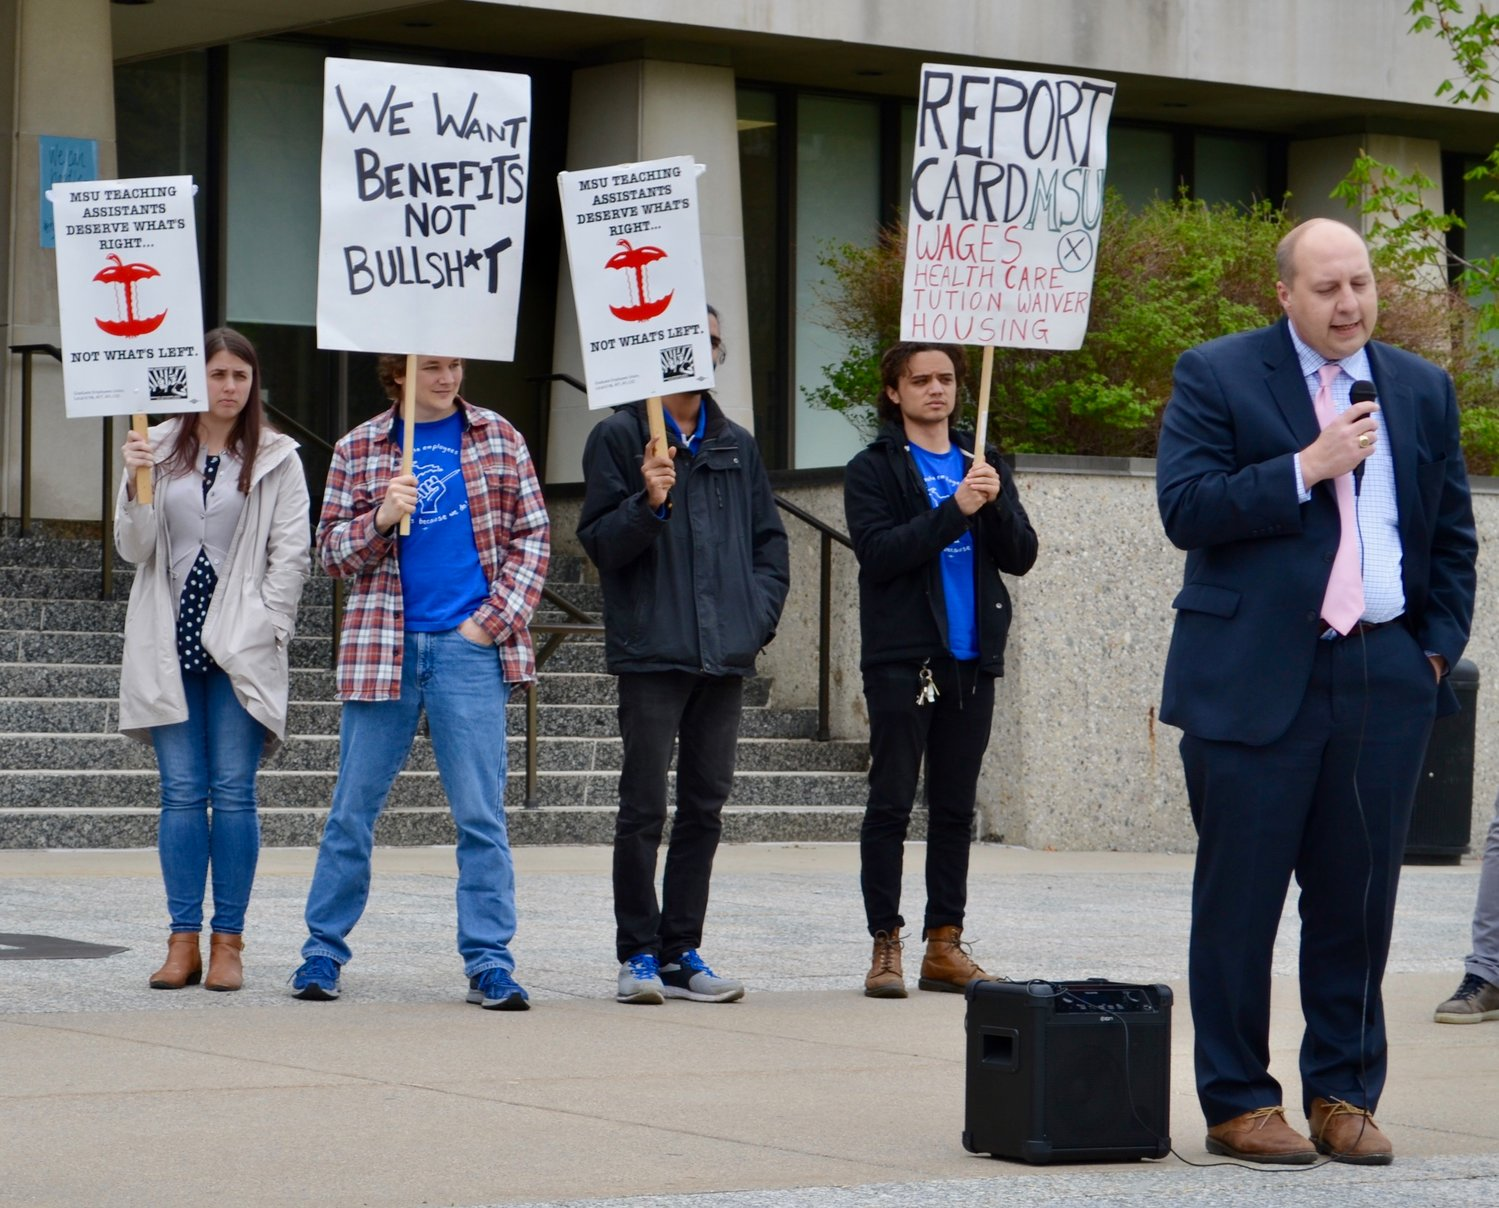 Msu Student Info >> Msu Graduate Student Union Rallies For Bigger Paychecks